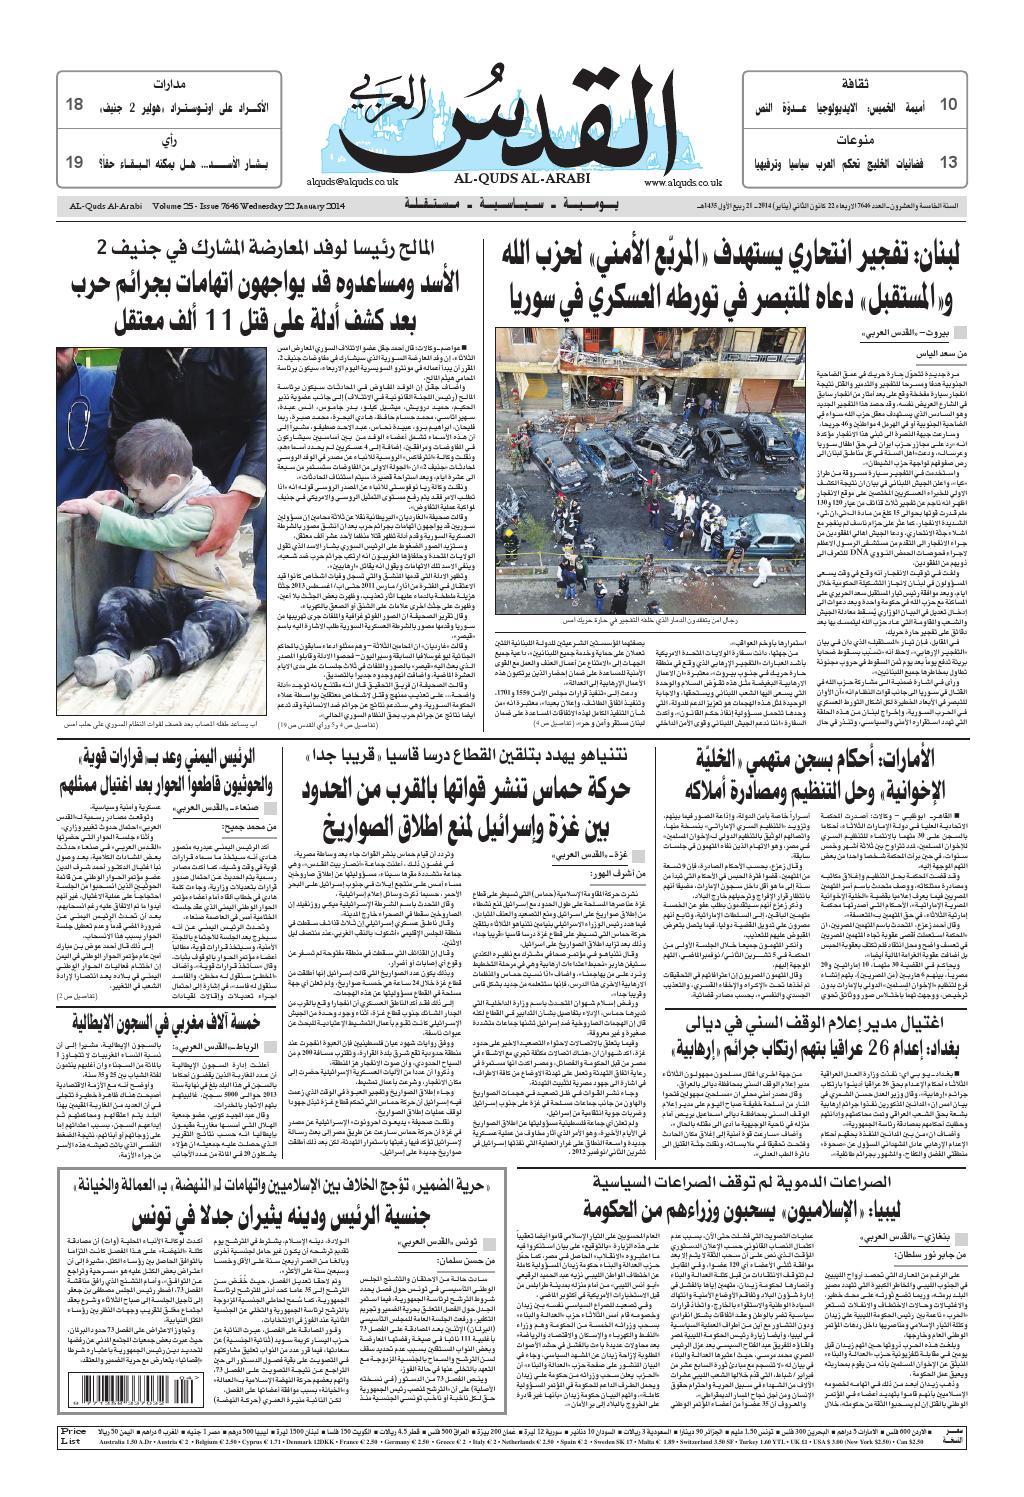 563c75195 صحيفة القدس العربي , الأربعاء 22.01.2014 by مركز الحدث - issuu